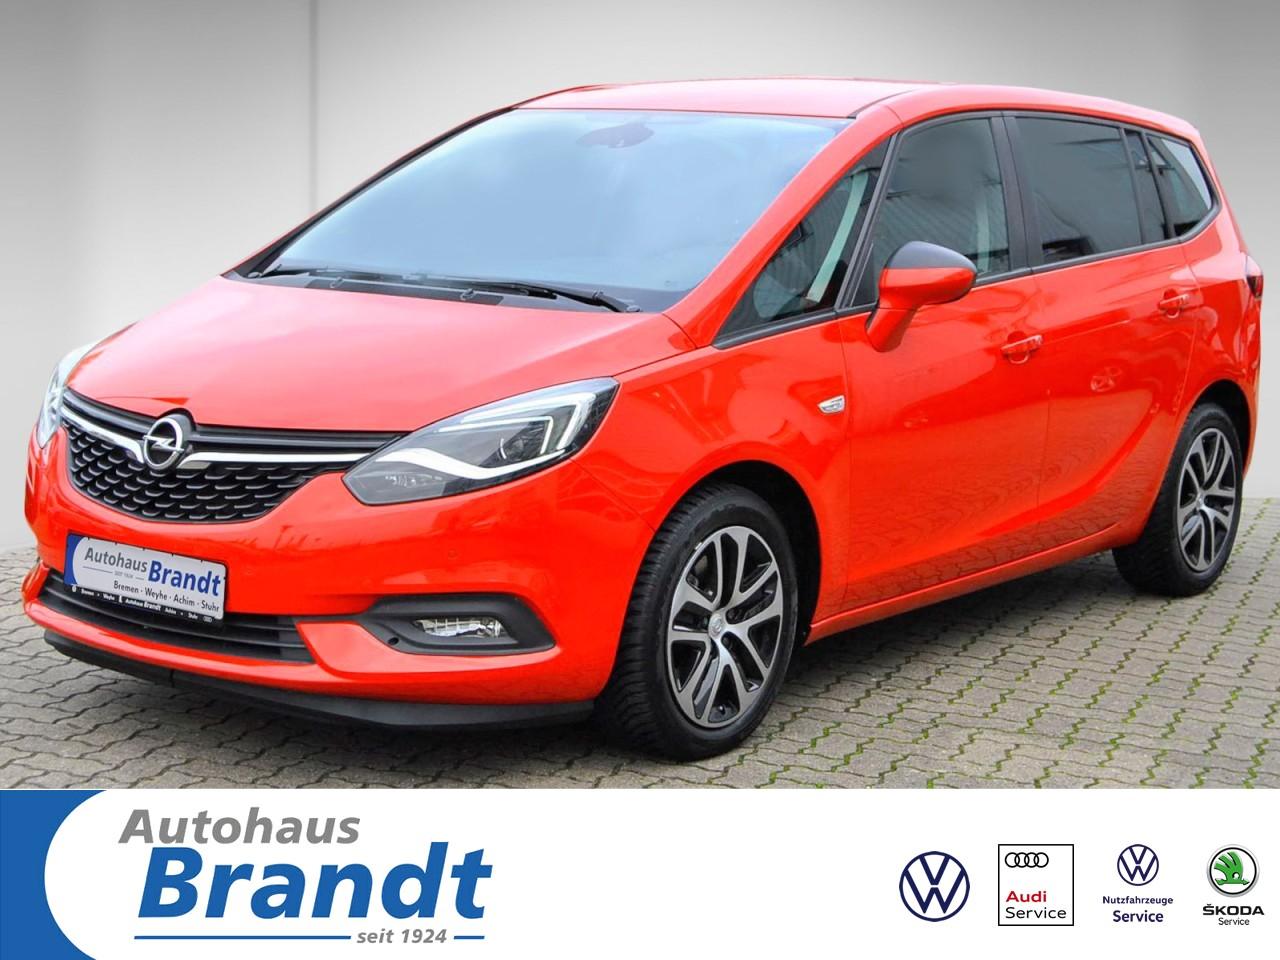 Opel Zafira 1.6 SIDI Turbo Edition Automatik AHK*LED, Jahr 2018, Benzin